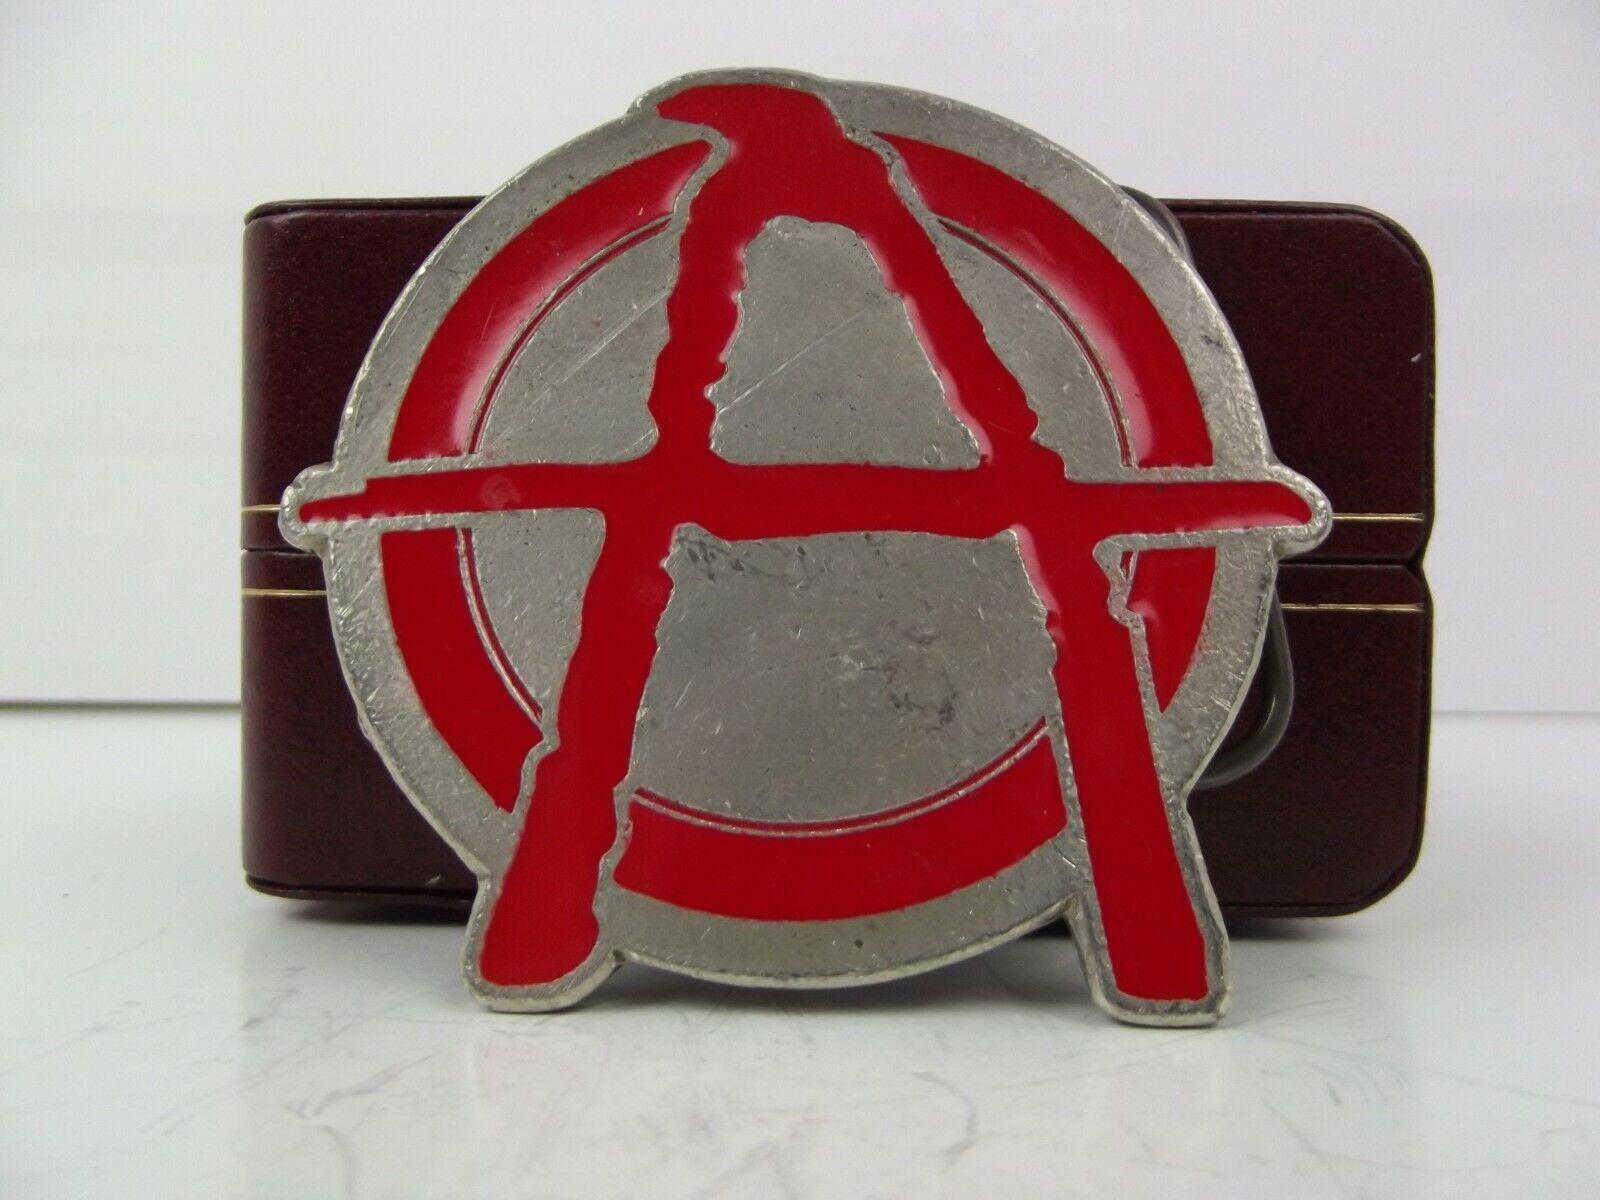 Anarchy Belt Buckle punk rock symbol signs